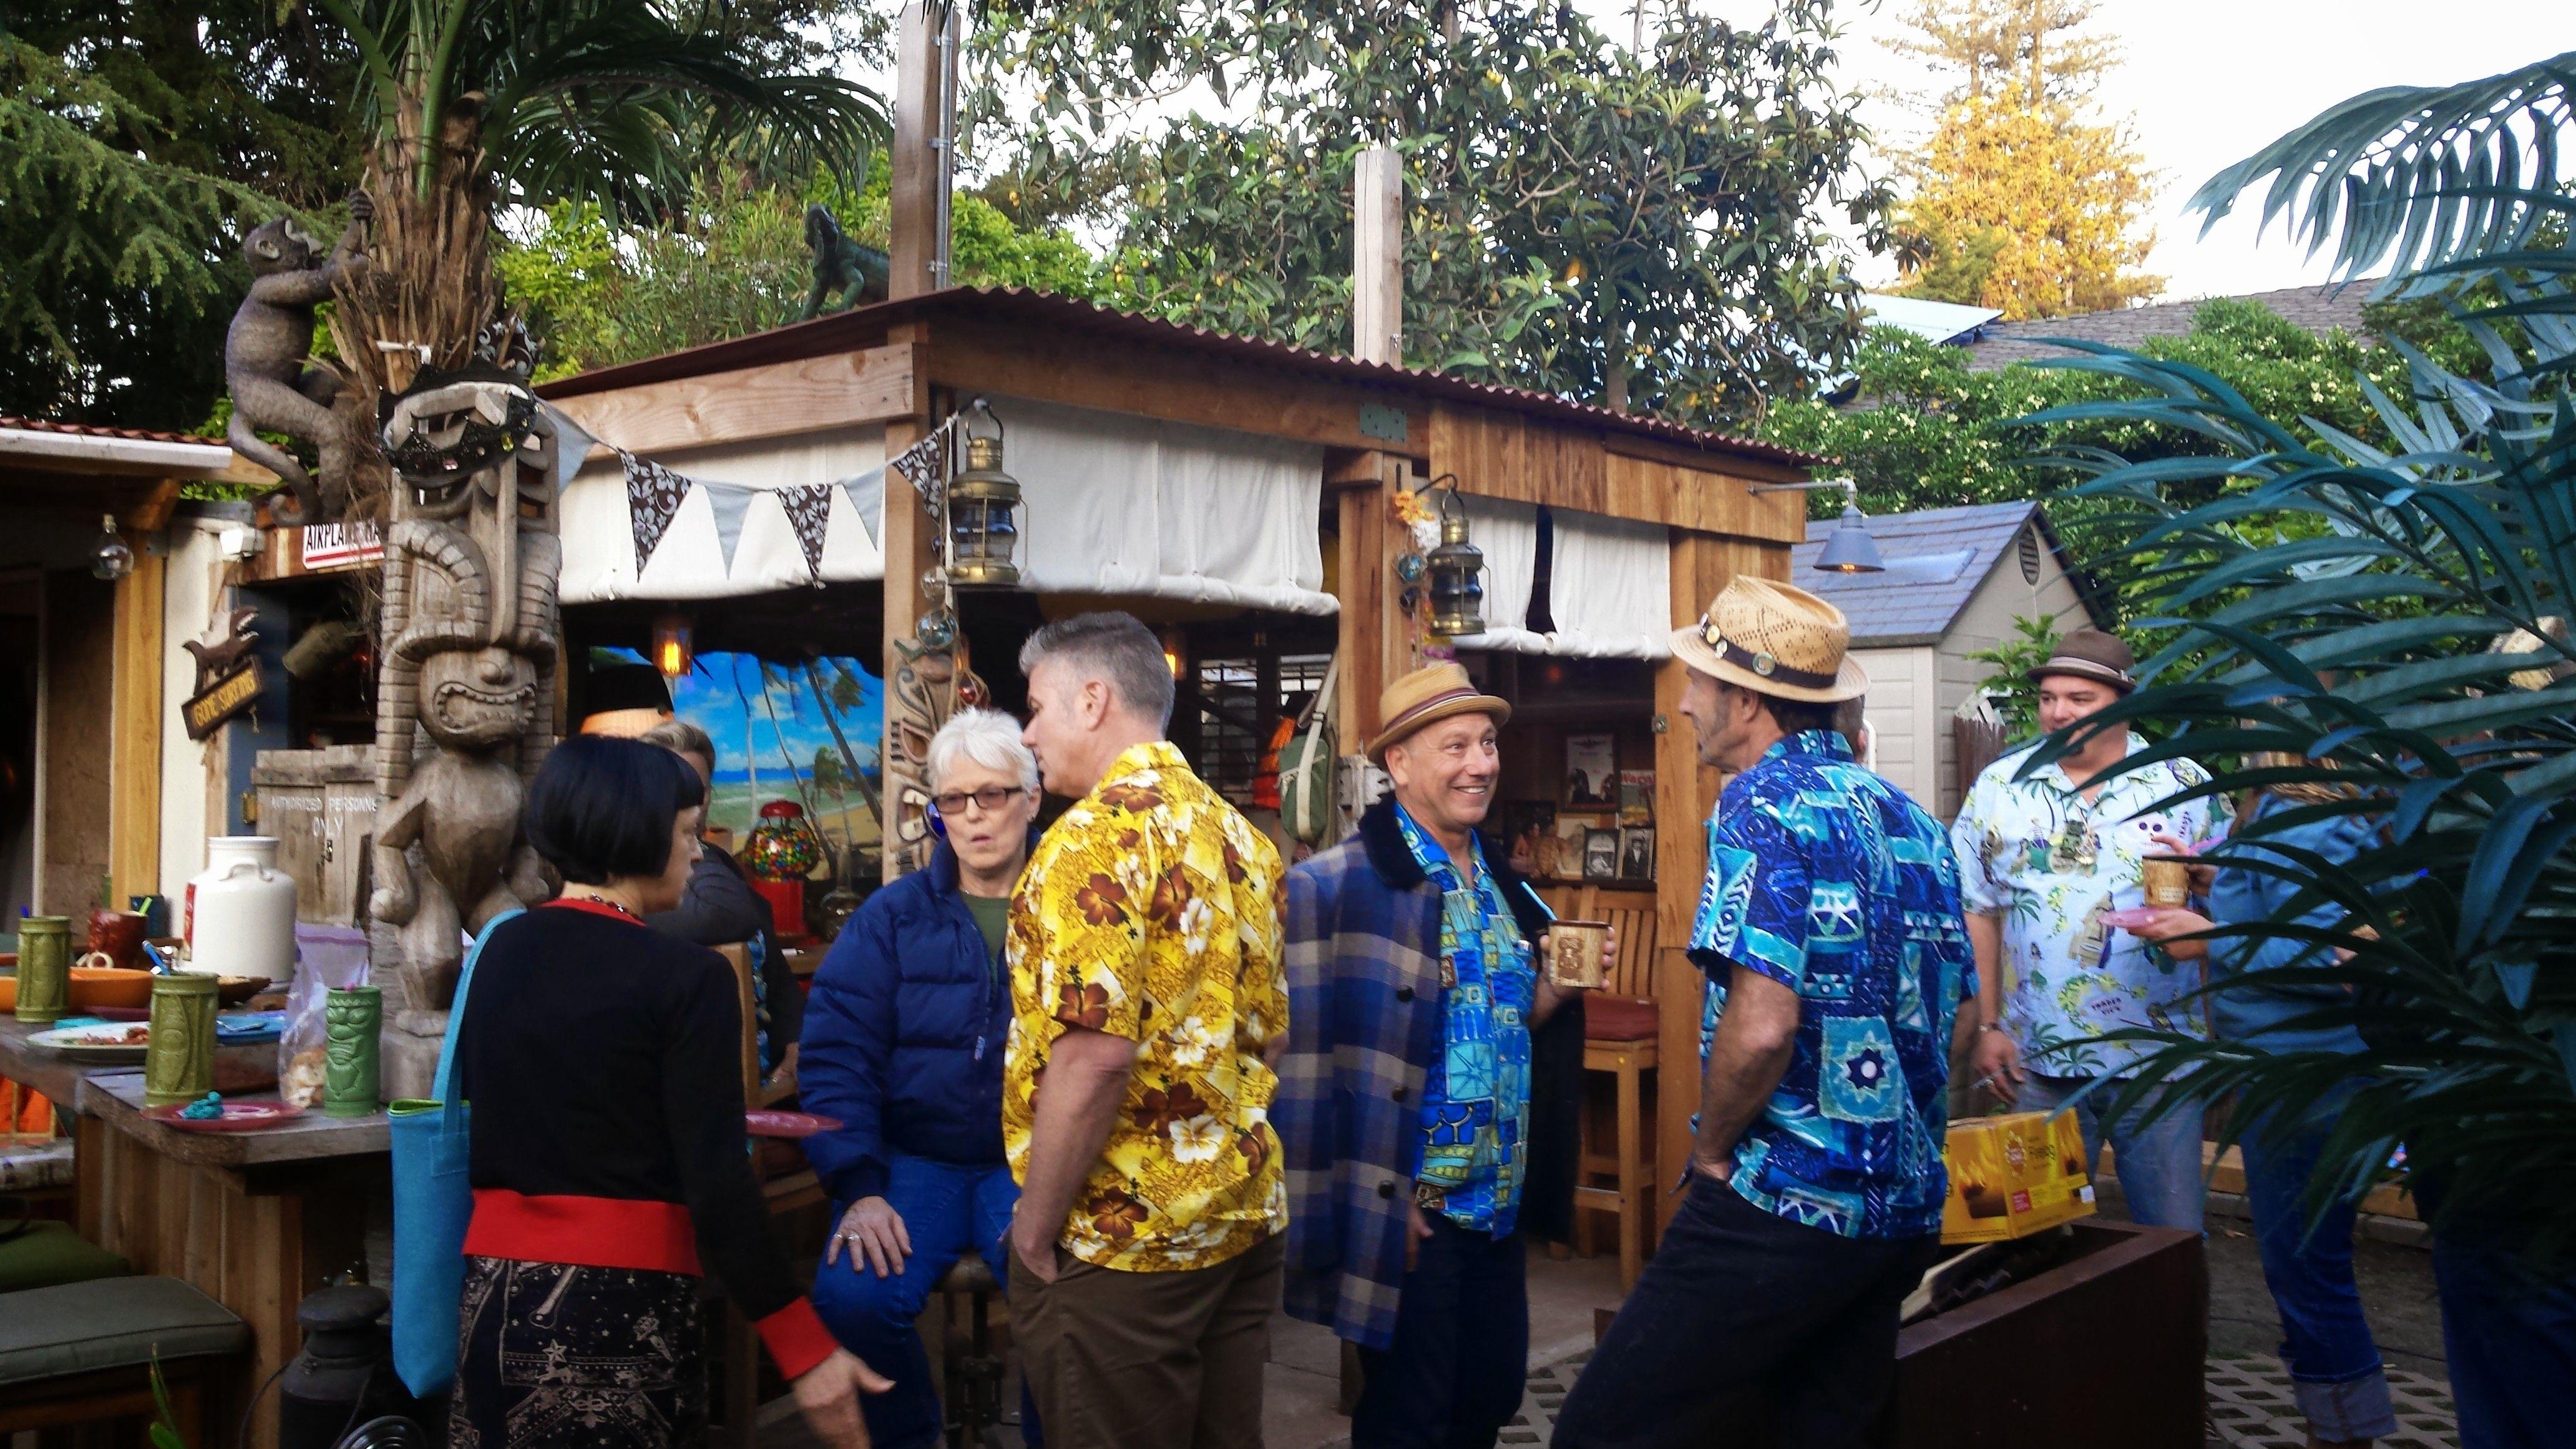 lucky star tiki bar in a menlo park ca backyard tiki travel